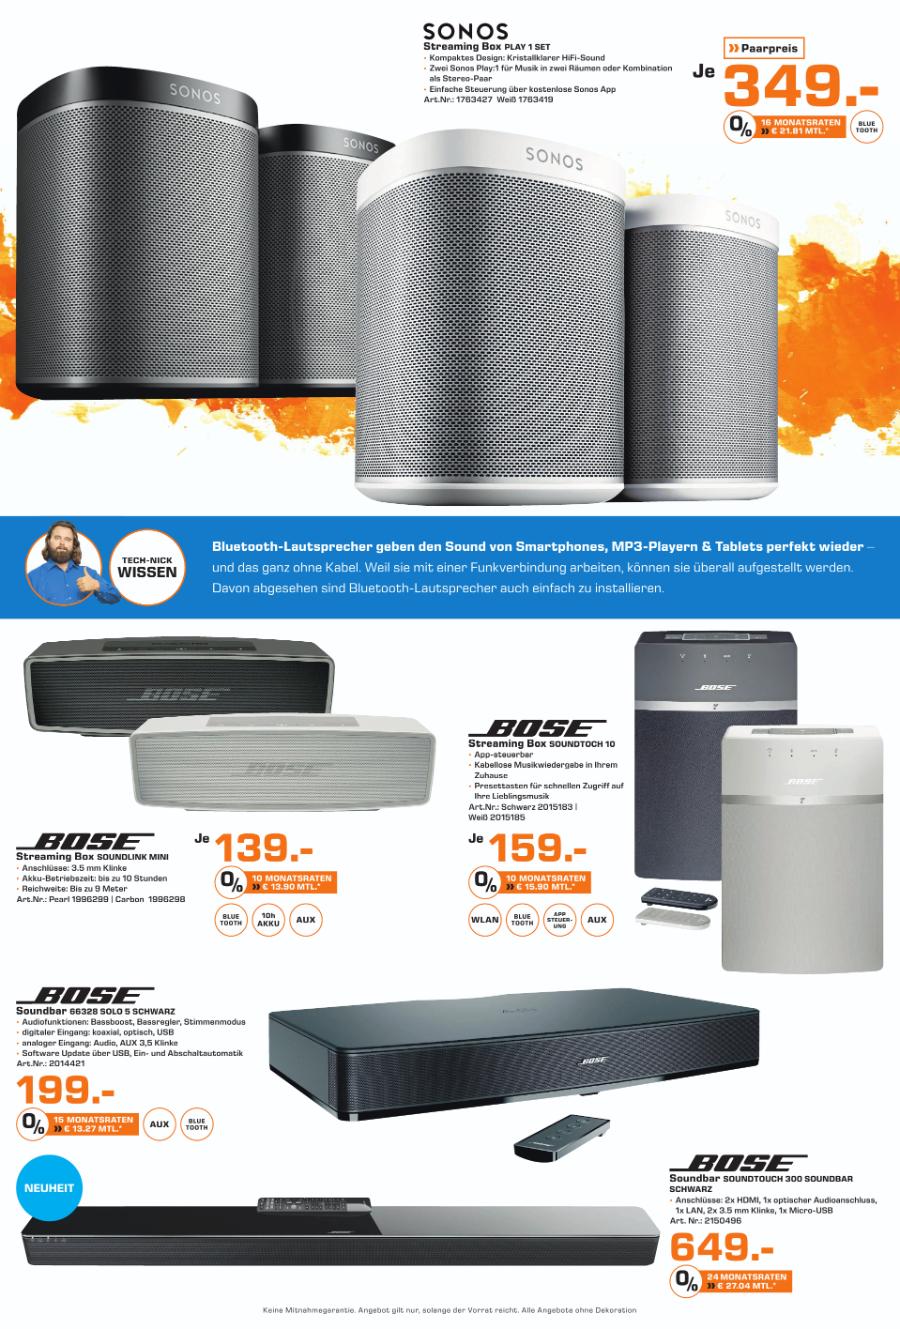 Bose Soundlink Mini 2 139,-€ / Sonos Play 1 349€ für 2  (lokal Saturn Flensburg - 10 Jahre Jubiläum)